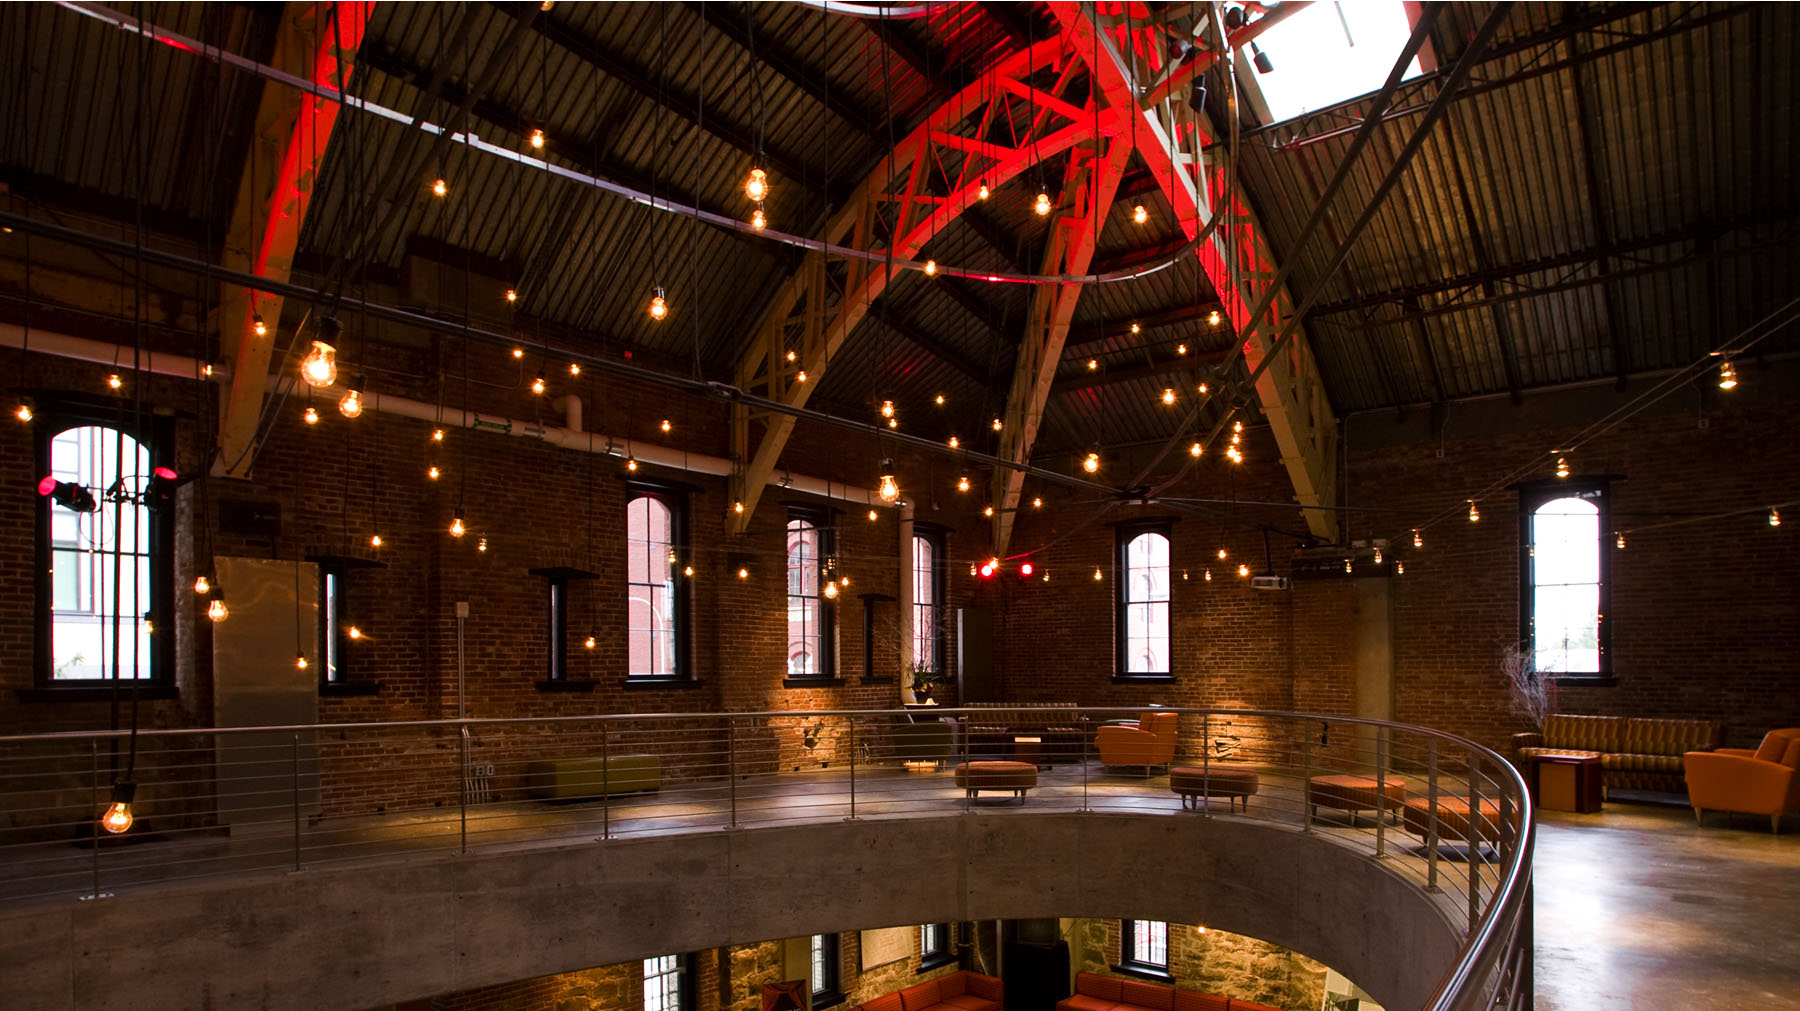 Gerding Theater The Armory, Glumac,